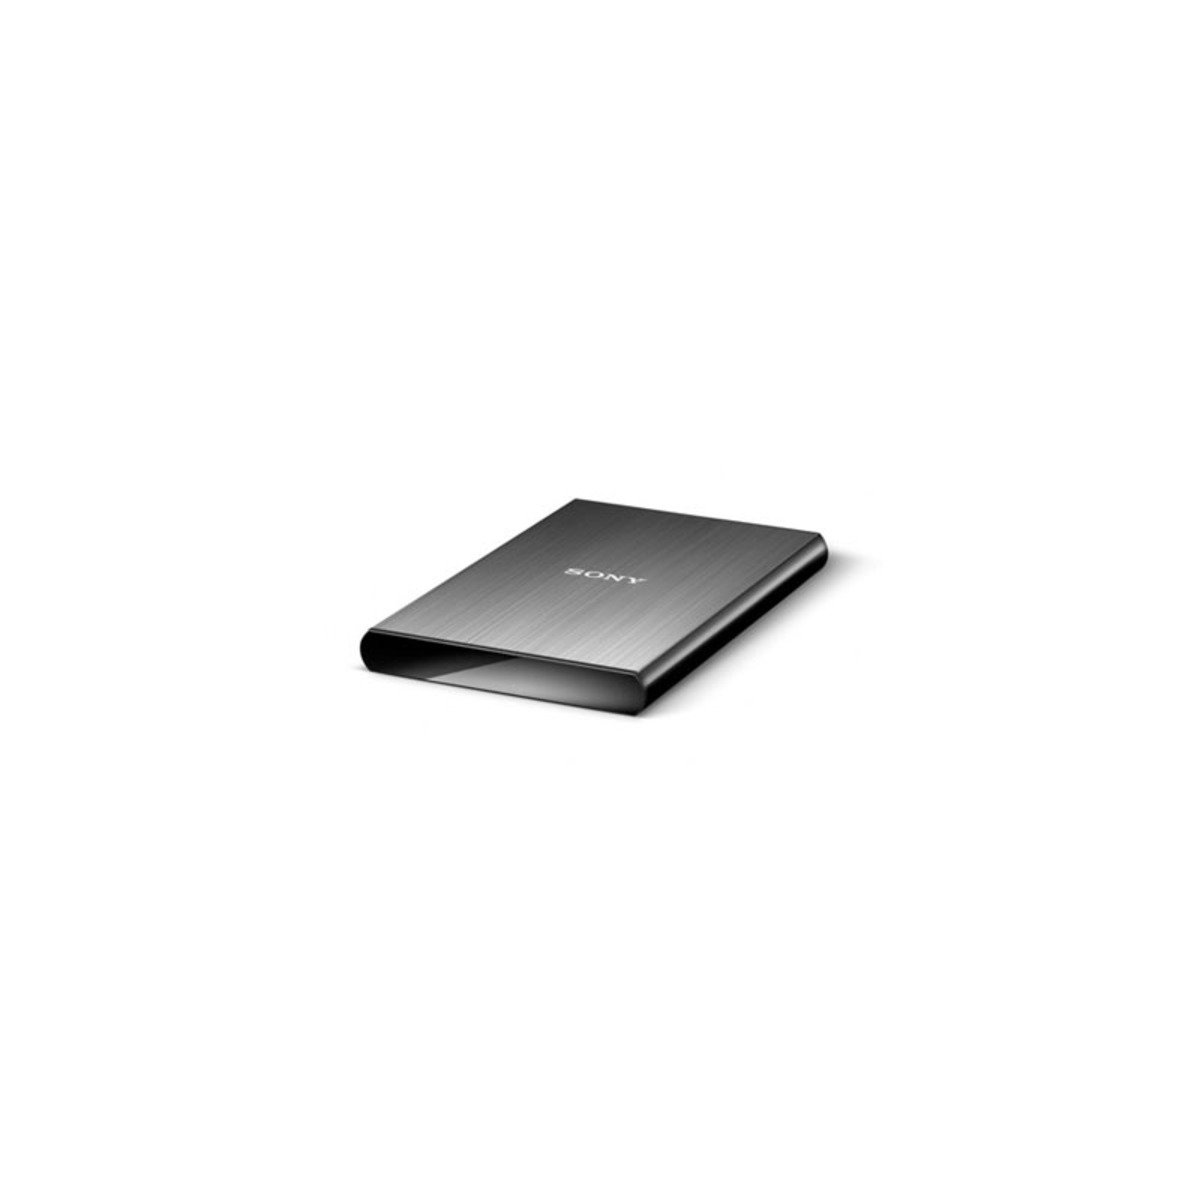 Jual Sony 25compact Slim 2tb Usb30 Hktvmall Termurah 2018 Wd Element 1tb Harddisk External 25ampquot Usb 30 Resmi Online Shopping